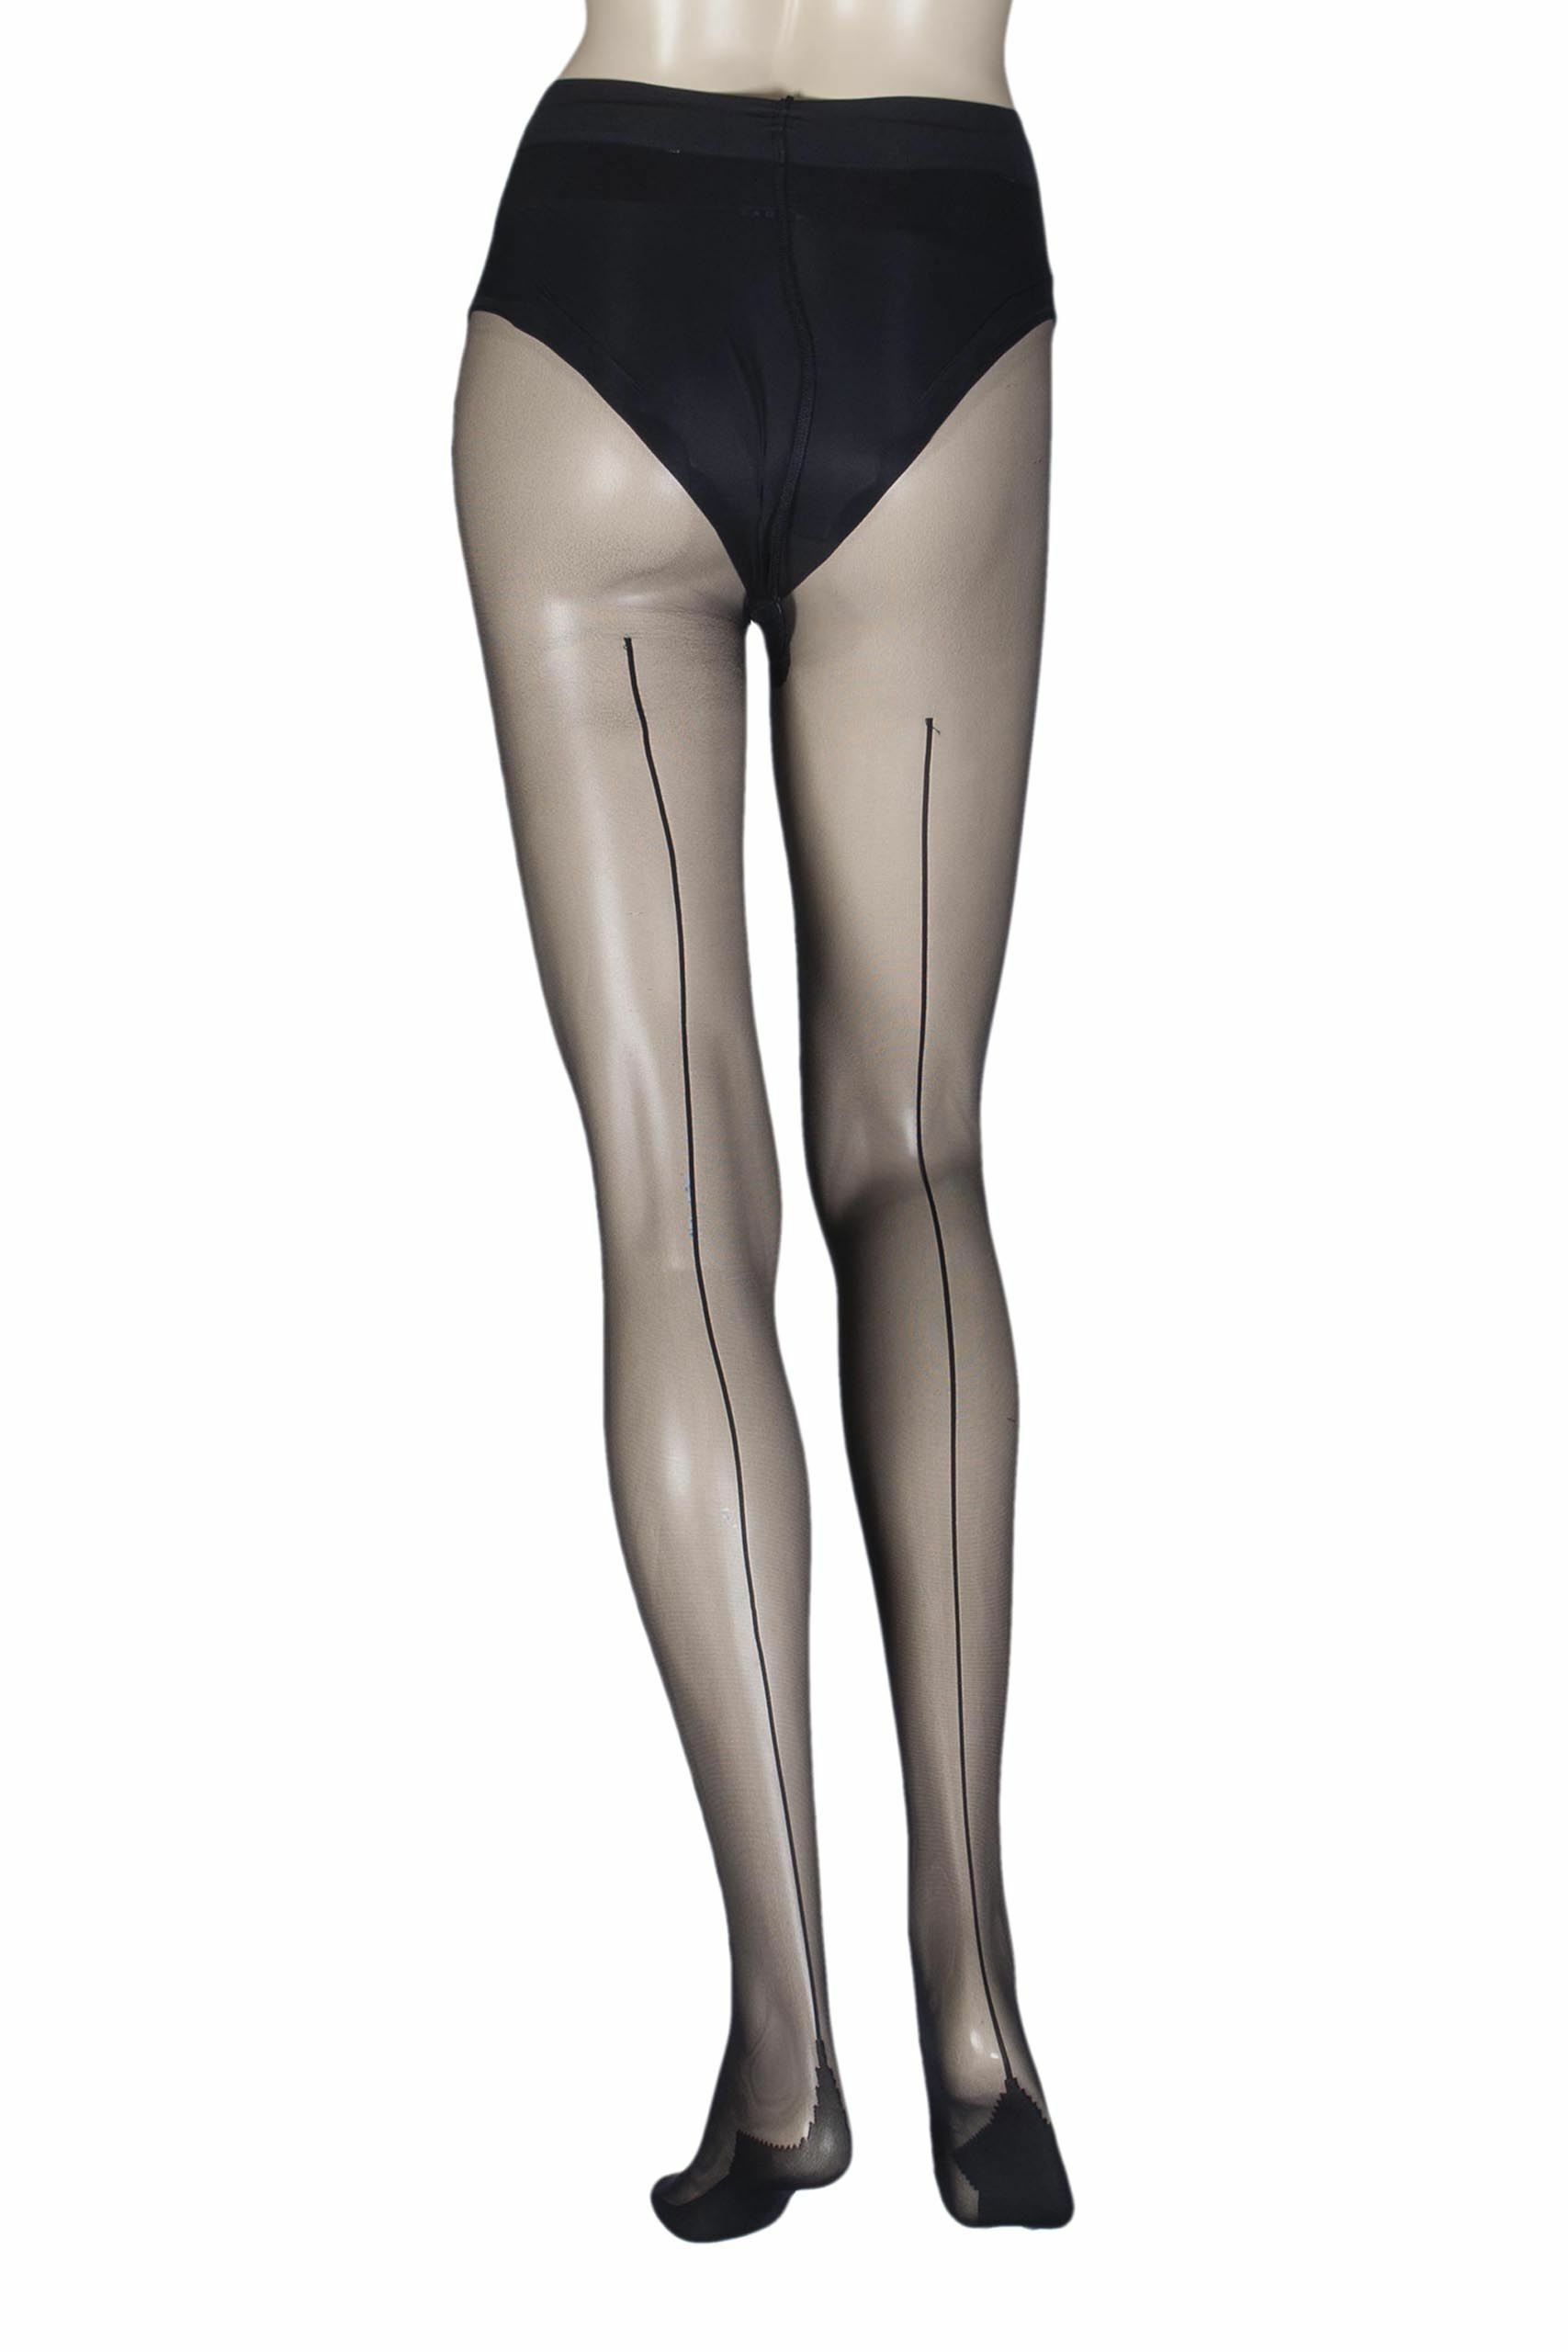 Image of 1 Pair Black Ultimate Sexy Sheer Back Seam Tights Ladies Medium - Calvin Klein